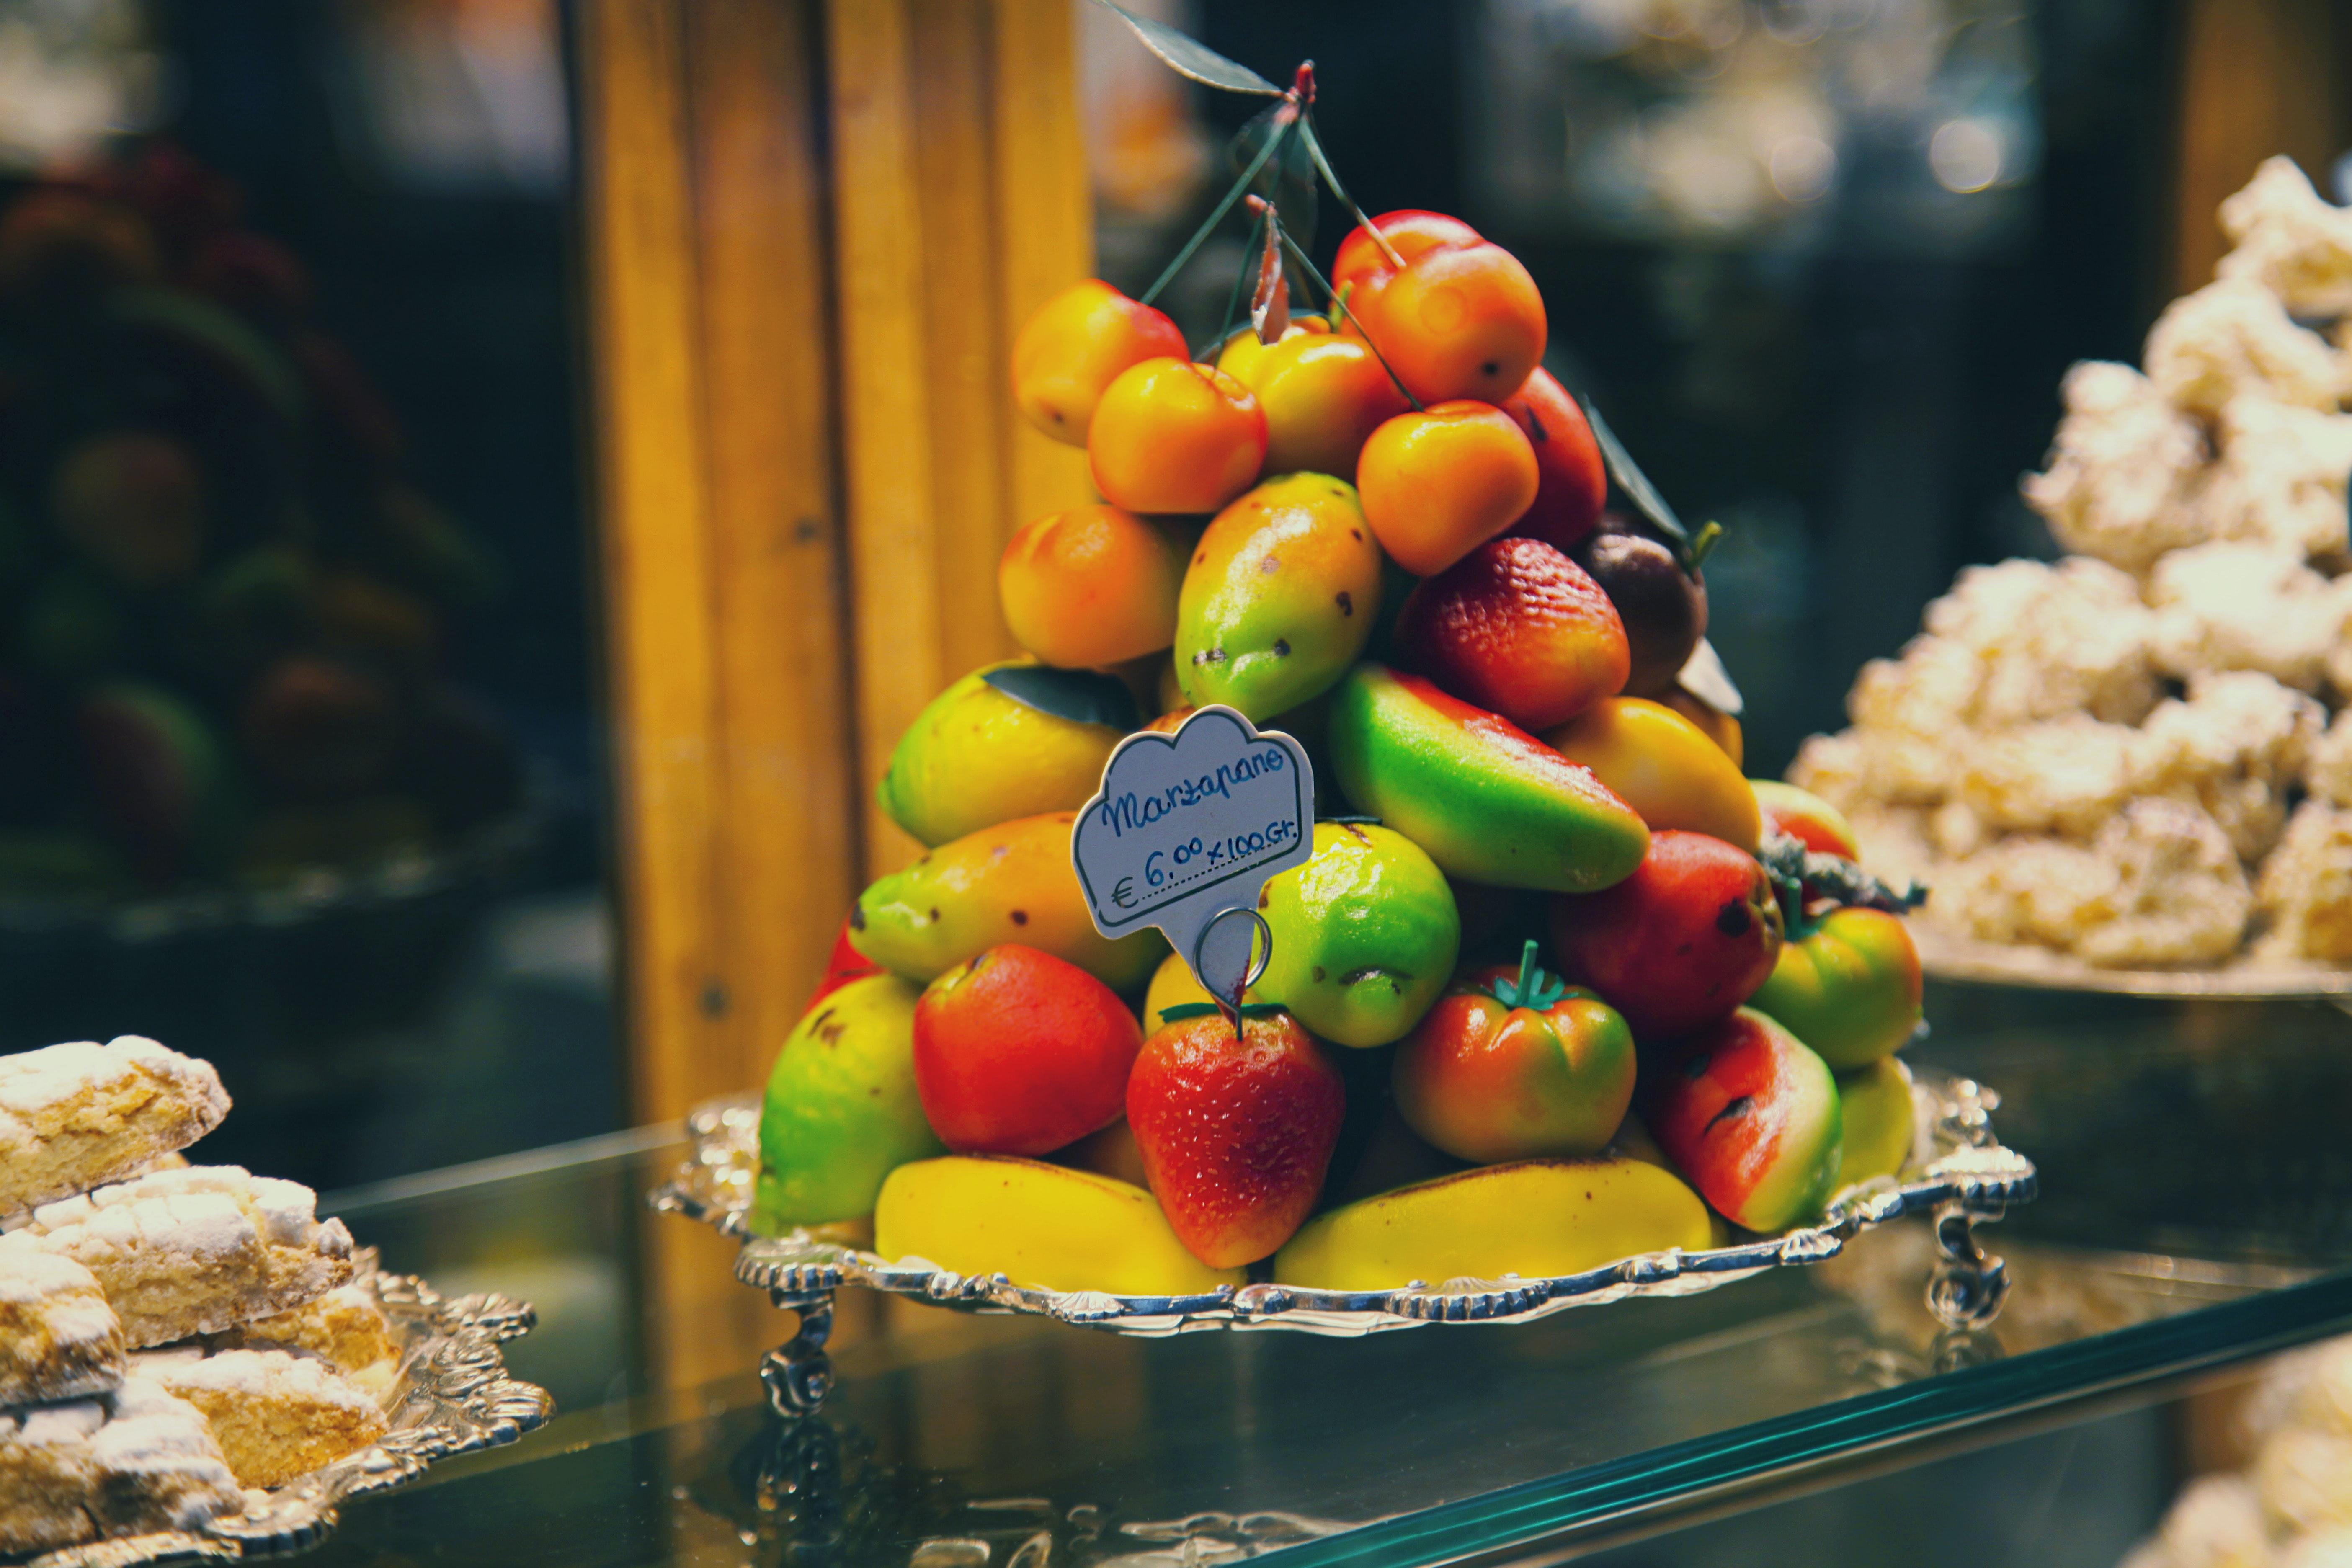 lindt, museum, chocolate, Switzerland, golden wrapper, Europe, sweet, local, authentic, localbini, biniblog, travel, experience, Niederegger Marzipan Museum in Lübeck, Germany, marizpan,